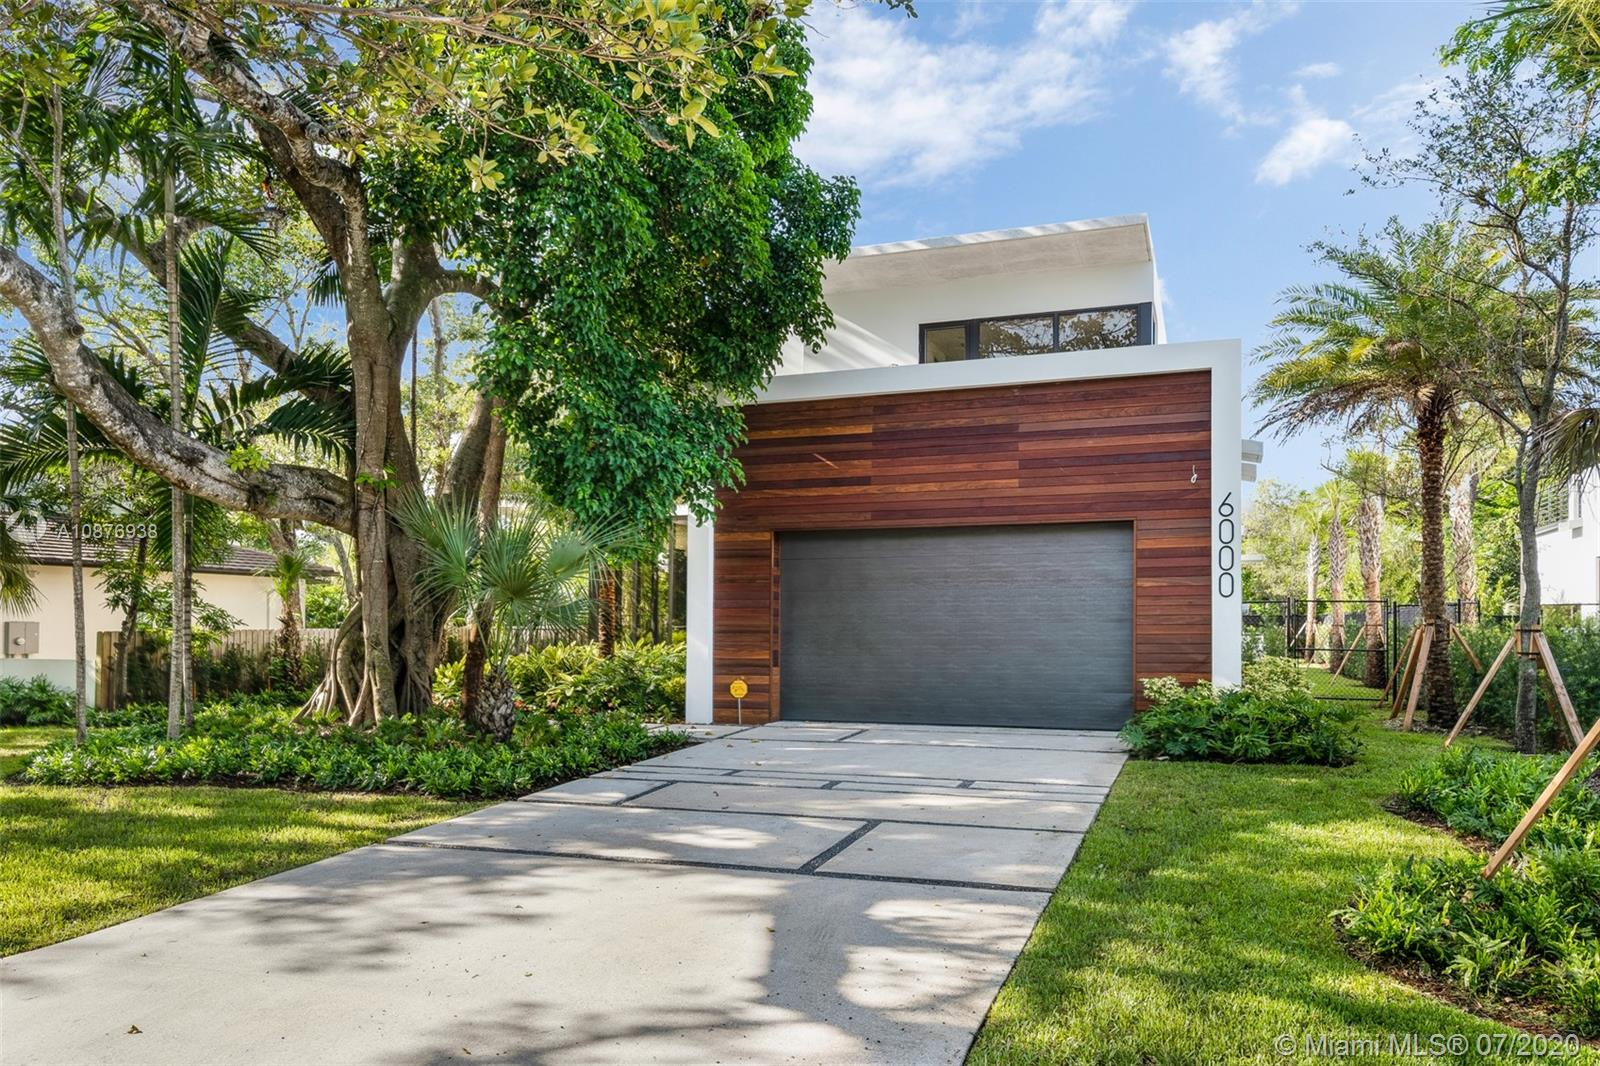 Palm Miami Heights # - 03 - photo